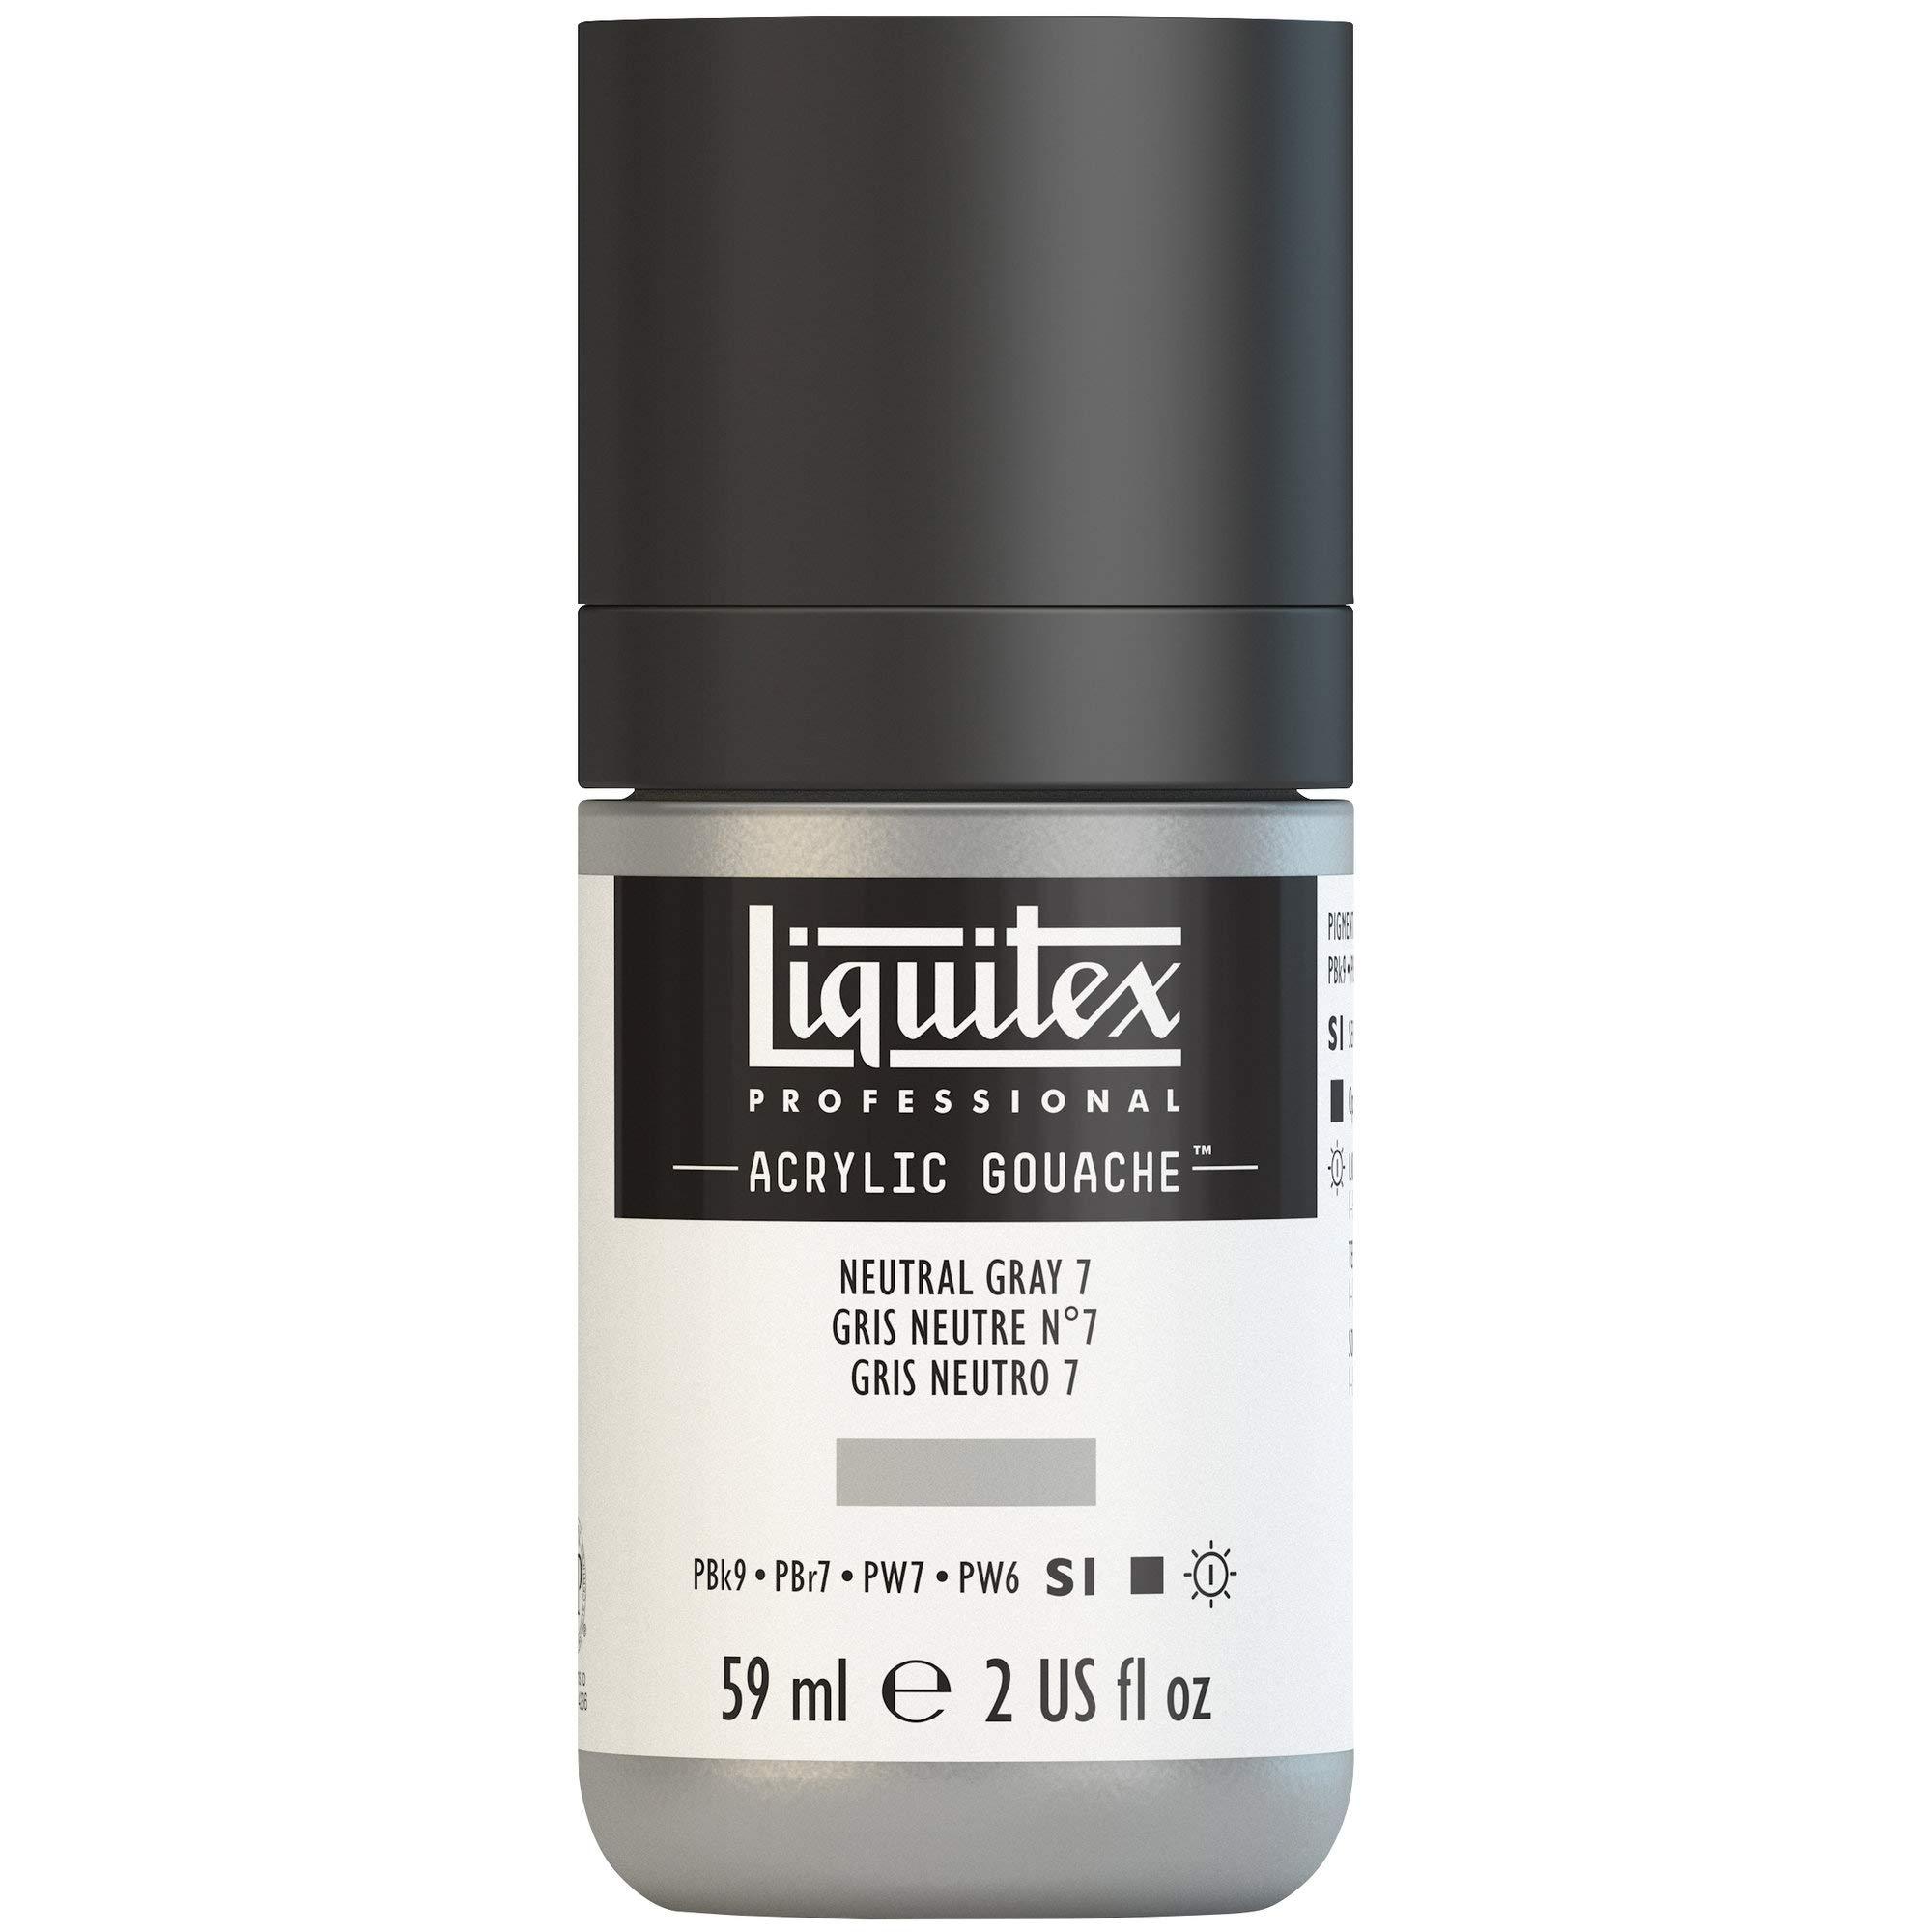 Liquitex Professional Acrylic Gouache 2-oz bottle, Neutral Grey 7